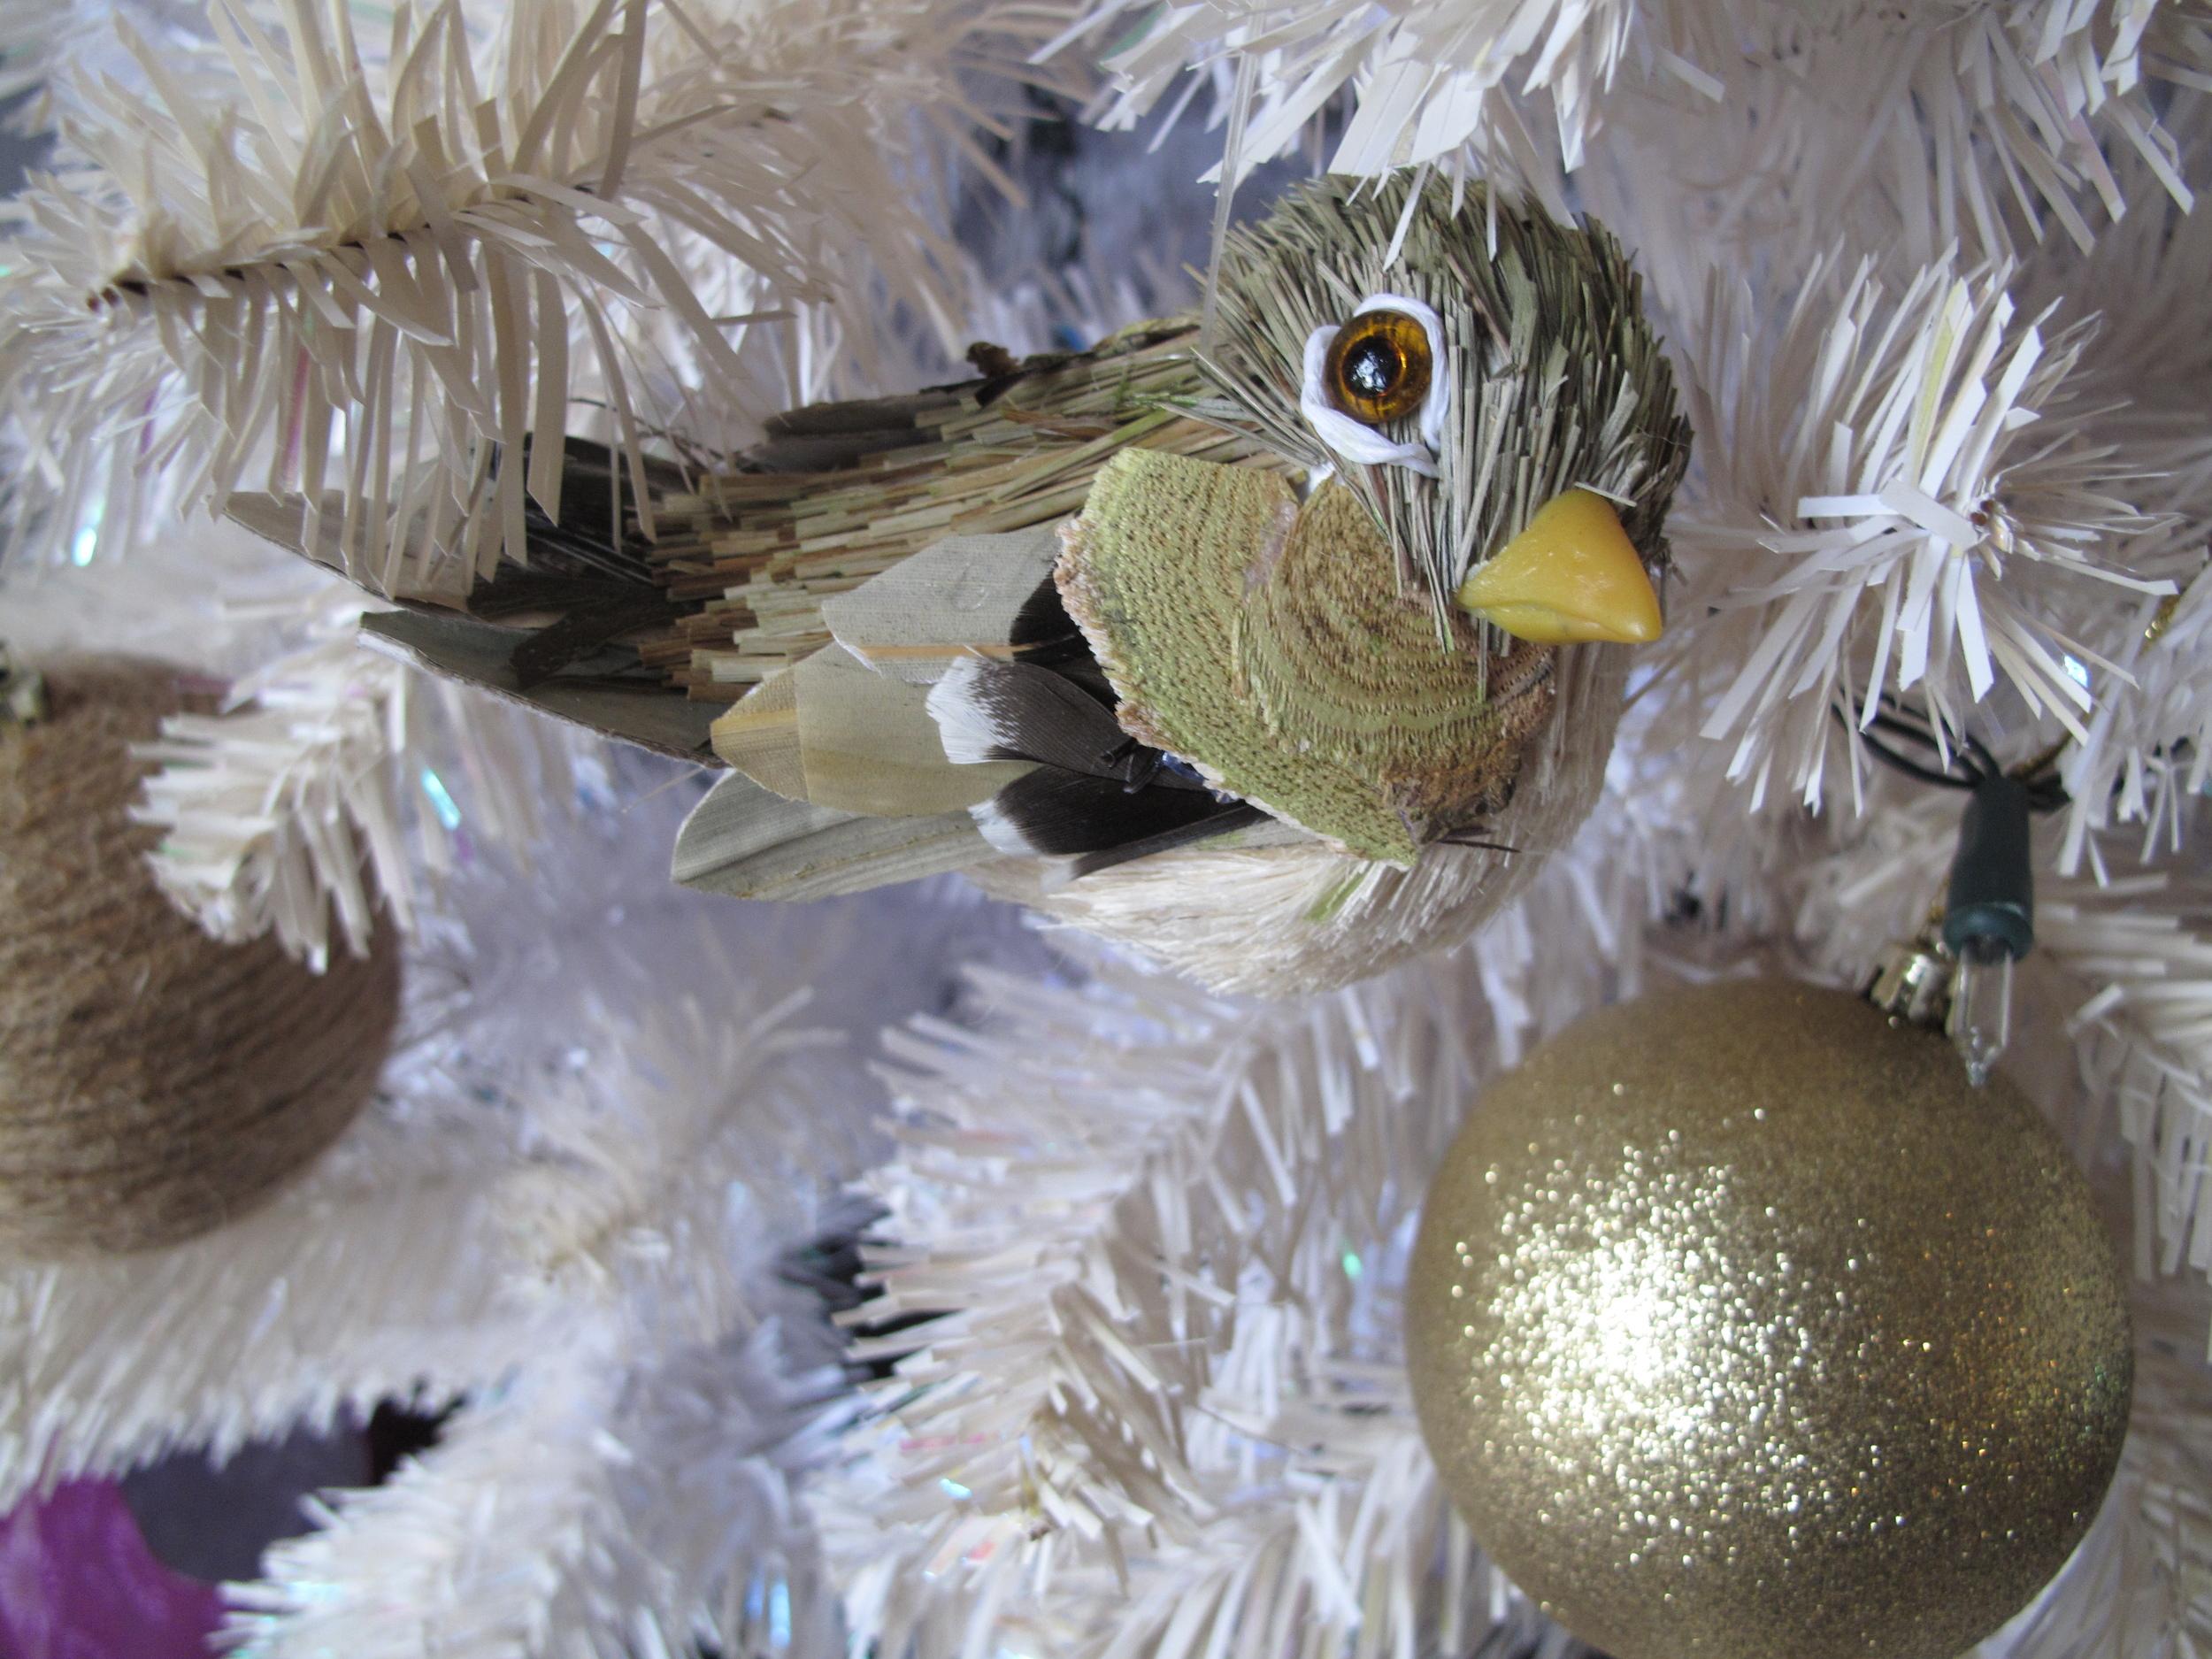 Vintage 1950's Christmas bird decoration